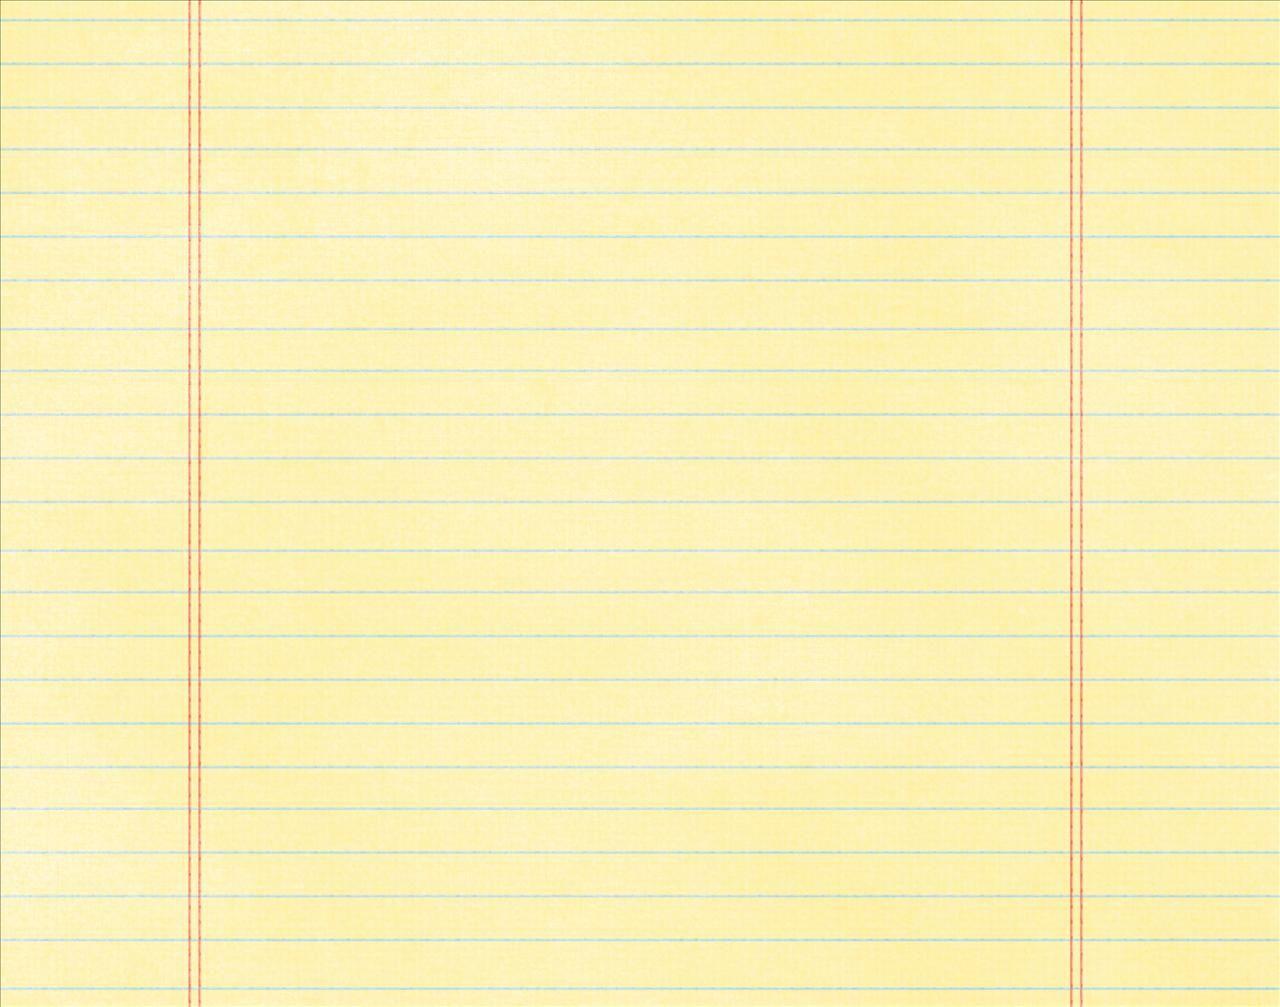 Notebook Paper Backgrounds  Loose Leaf Paper Background